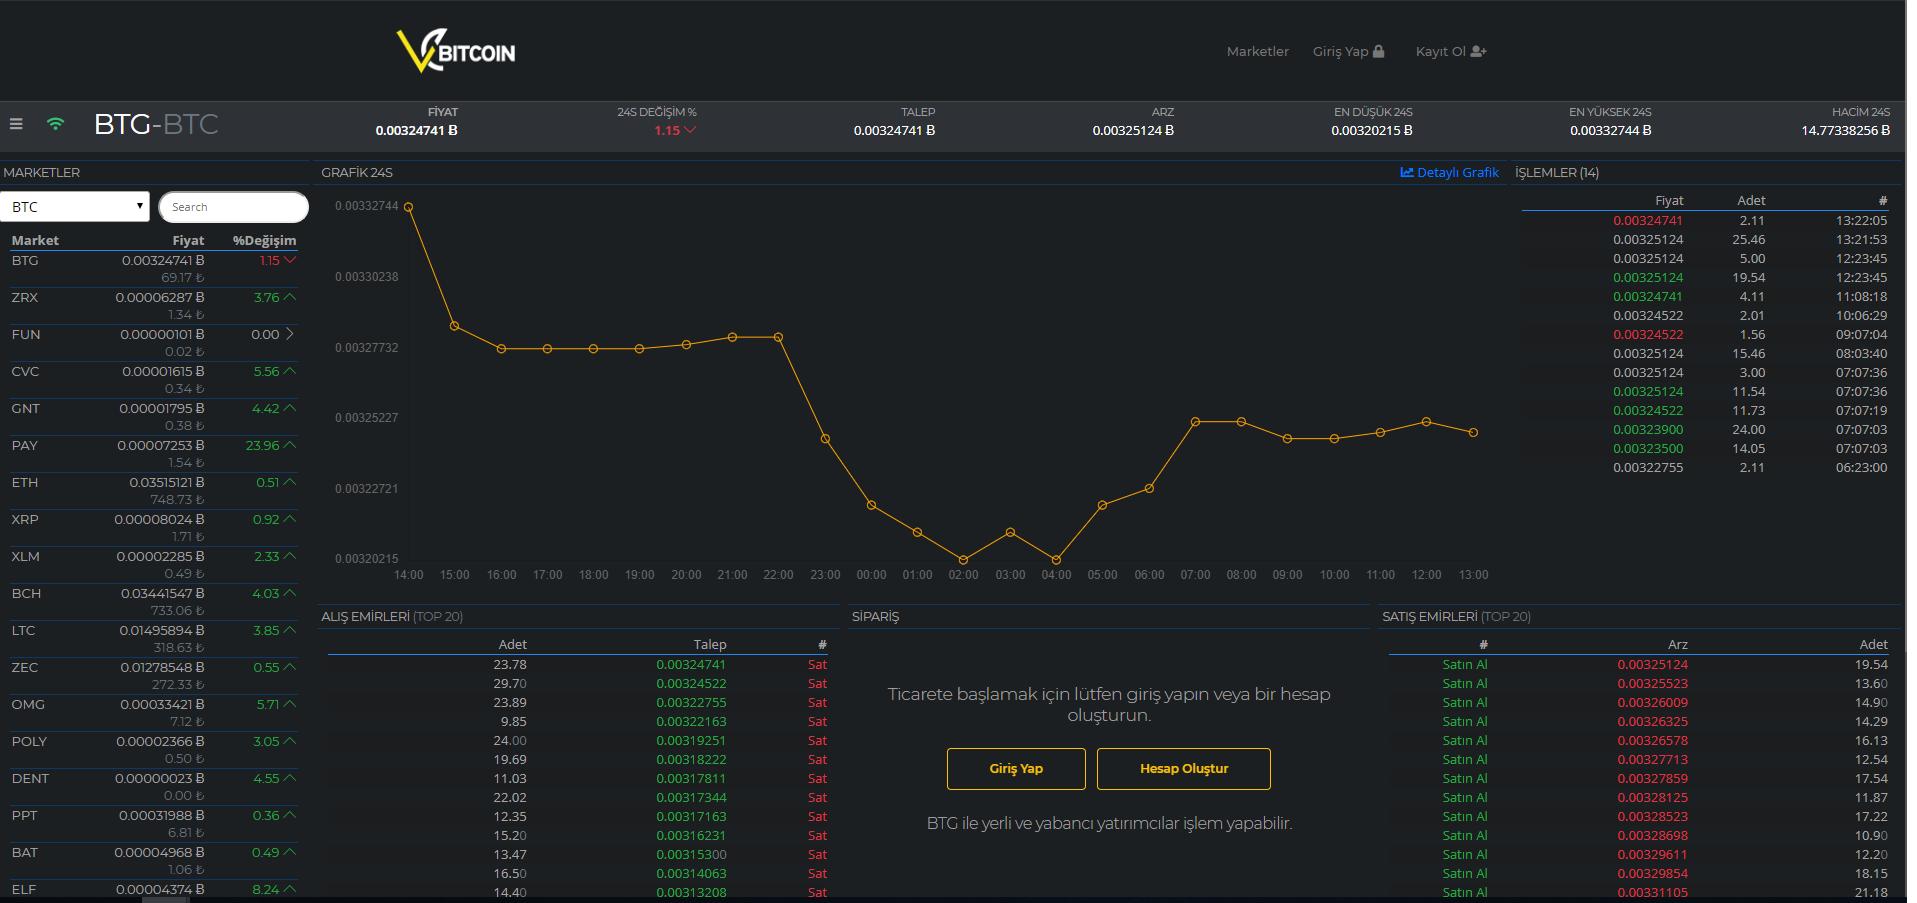 Vebitcoin Trading View